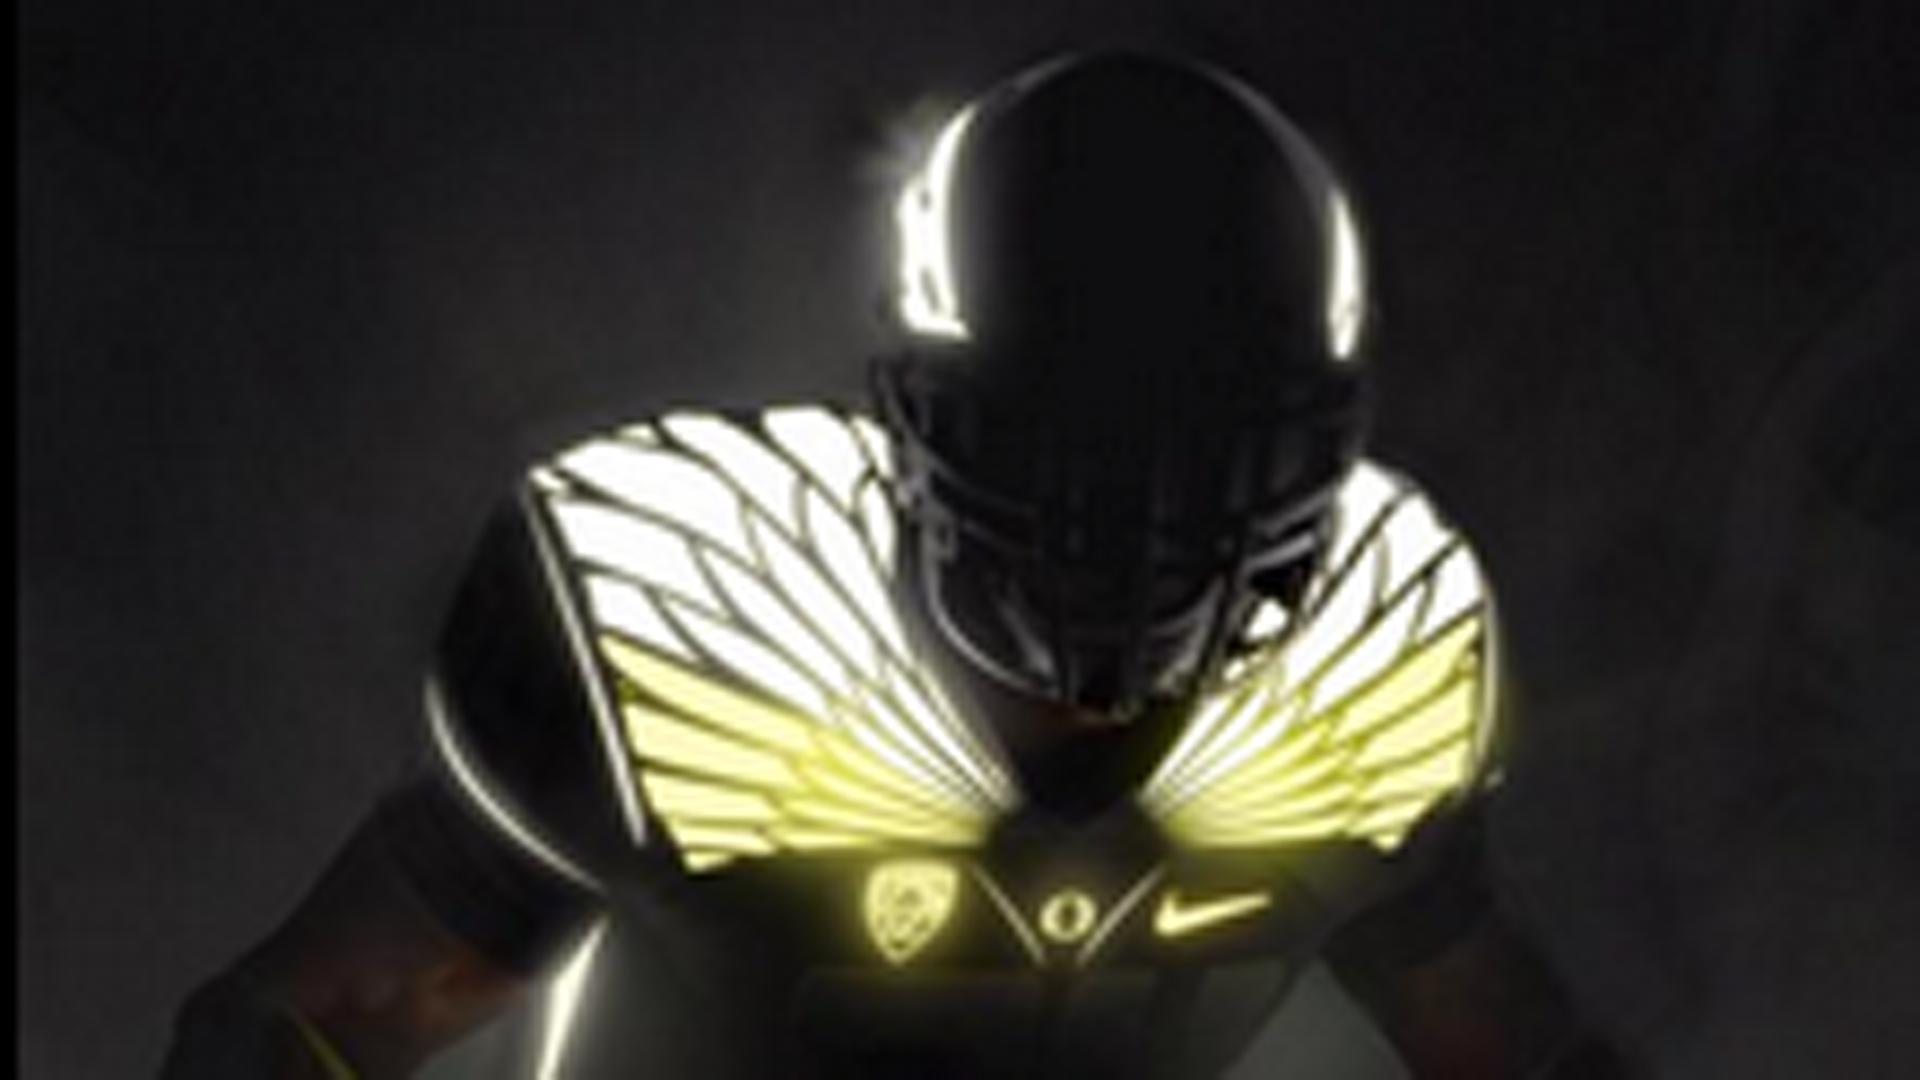 buy popular d8f38 da99f Oregon teases the idea of glow in the dark uniforms for 2015 ...